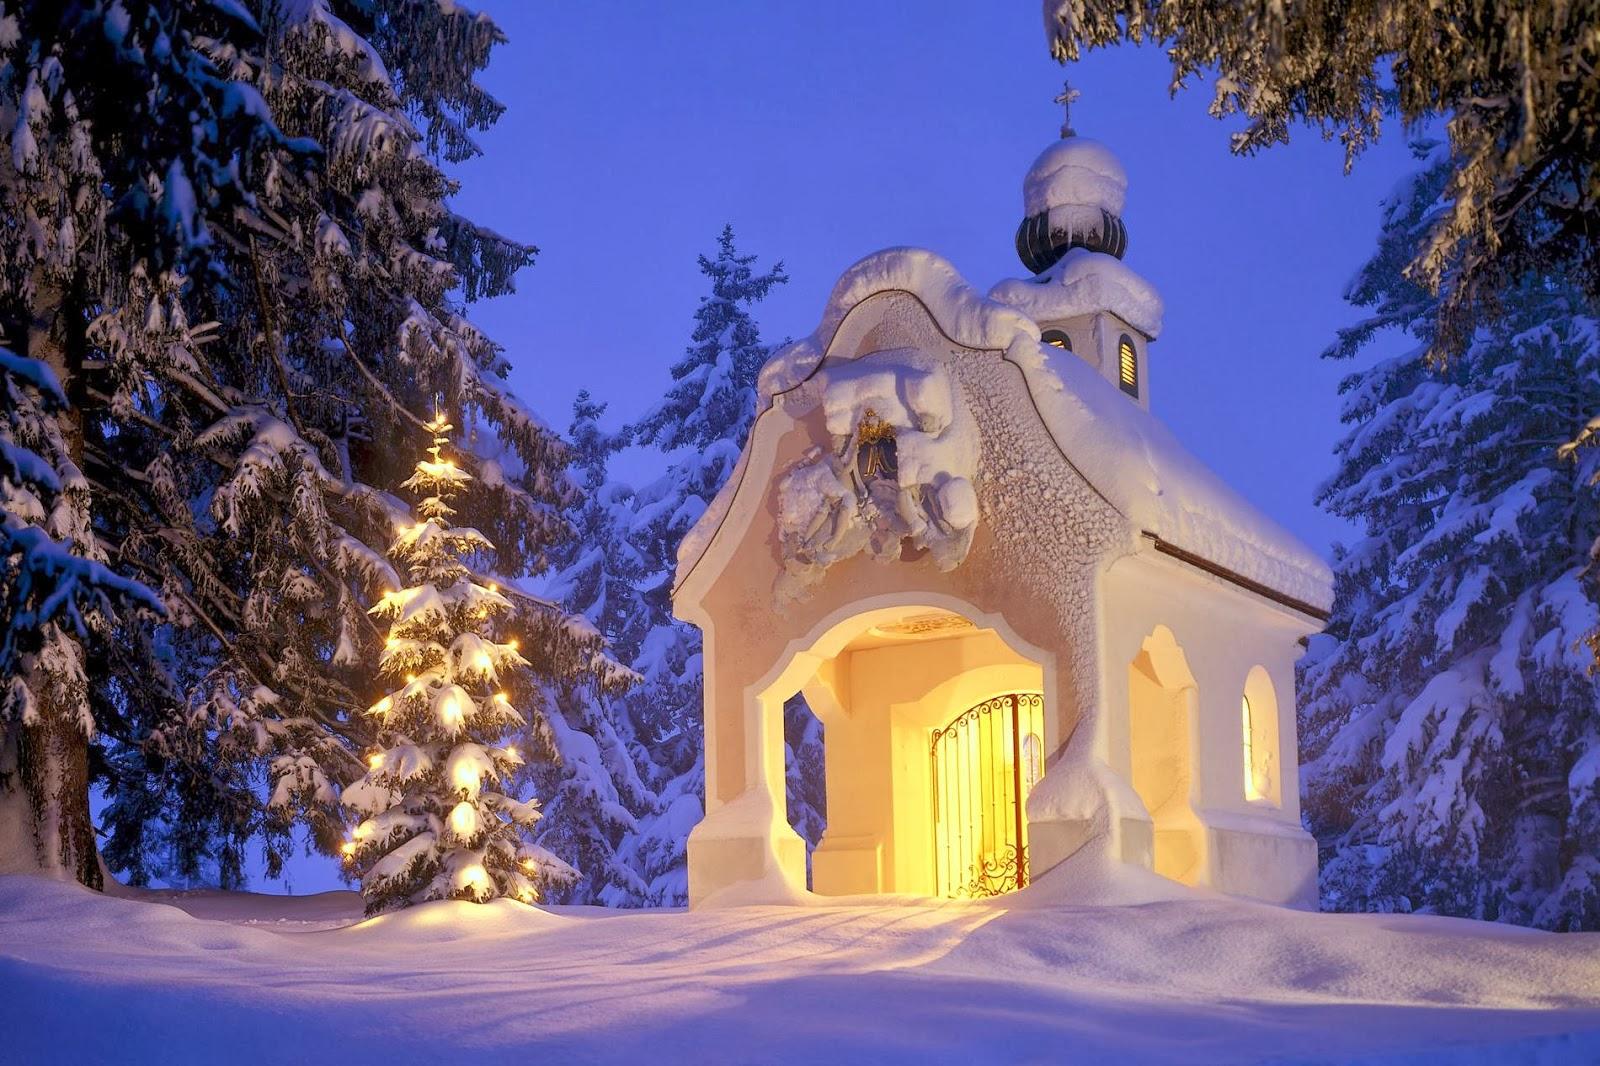 Merry Christmas In Vienna Austria HD Wallpaper  Stylish